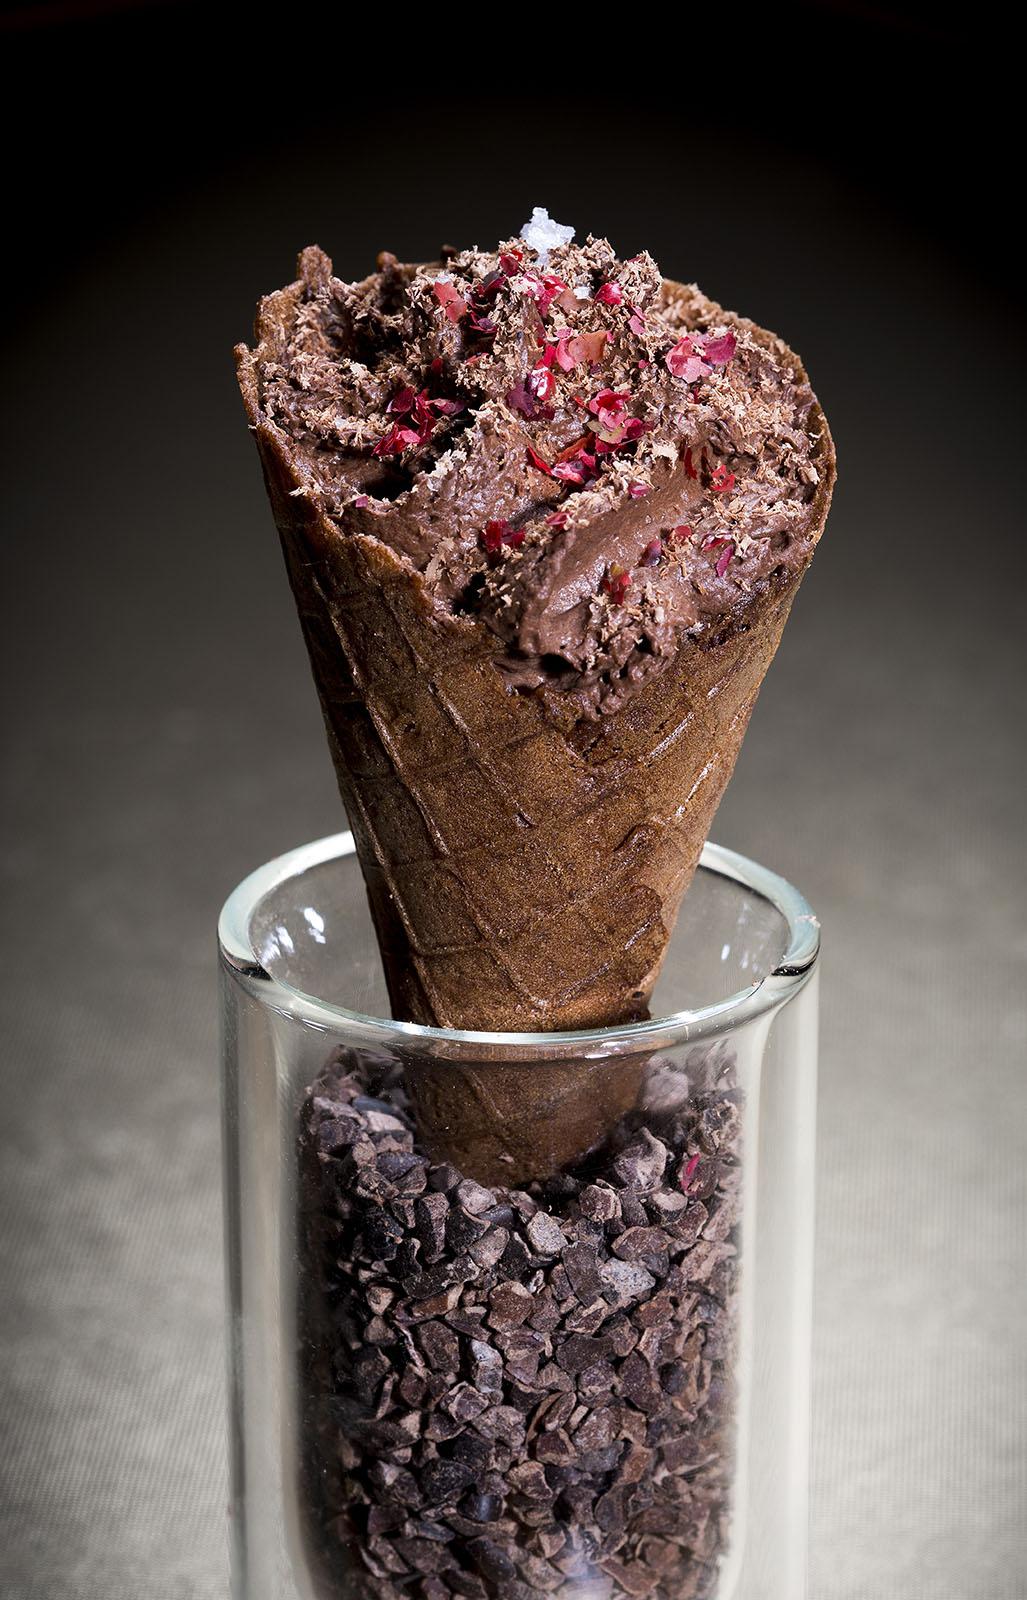 20 Mini Bar - Cone de chocolate em 3 texturas © Paulo Barata